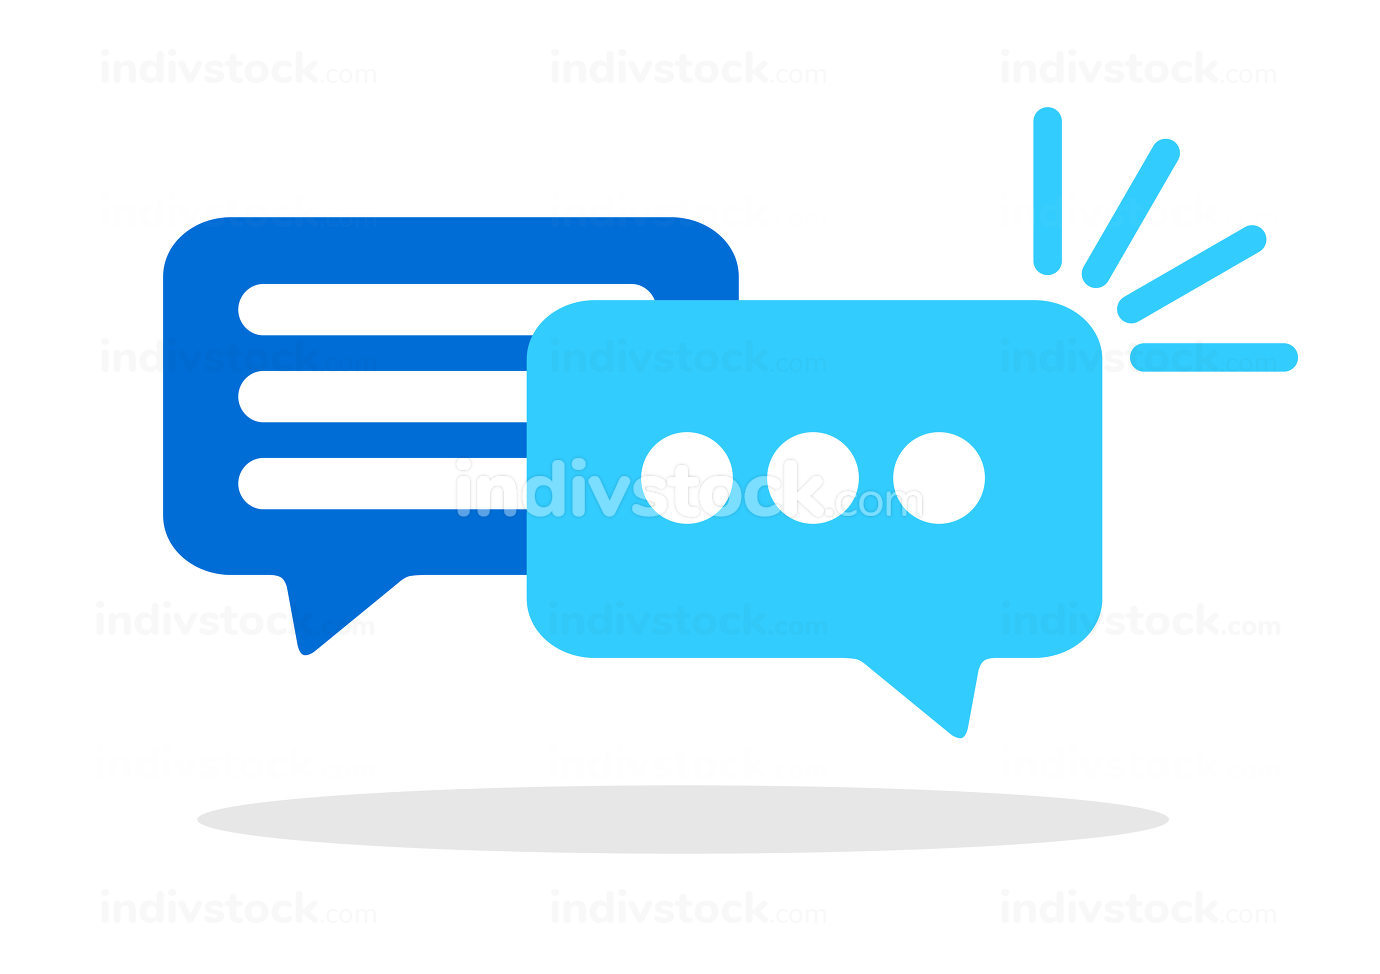 An illustration of a speech bubbles conversation symbol